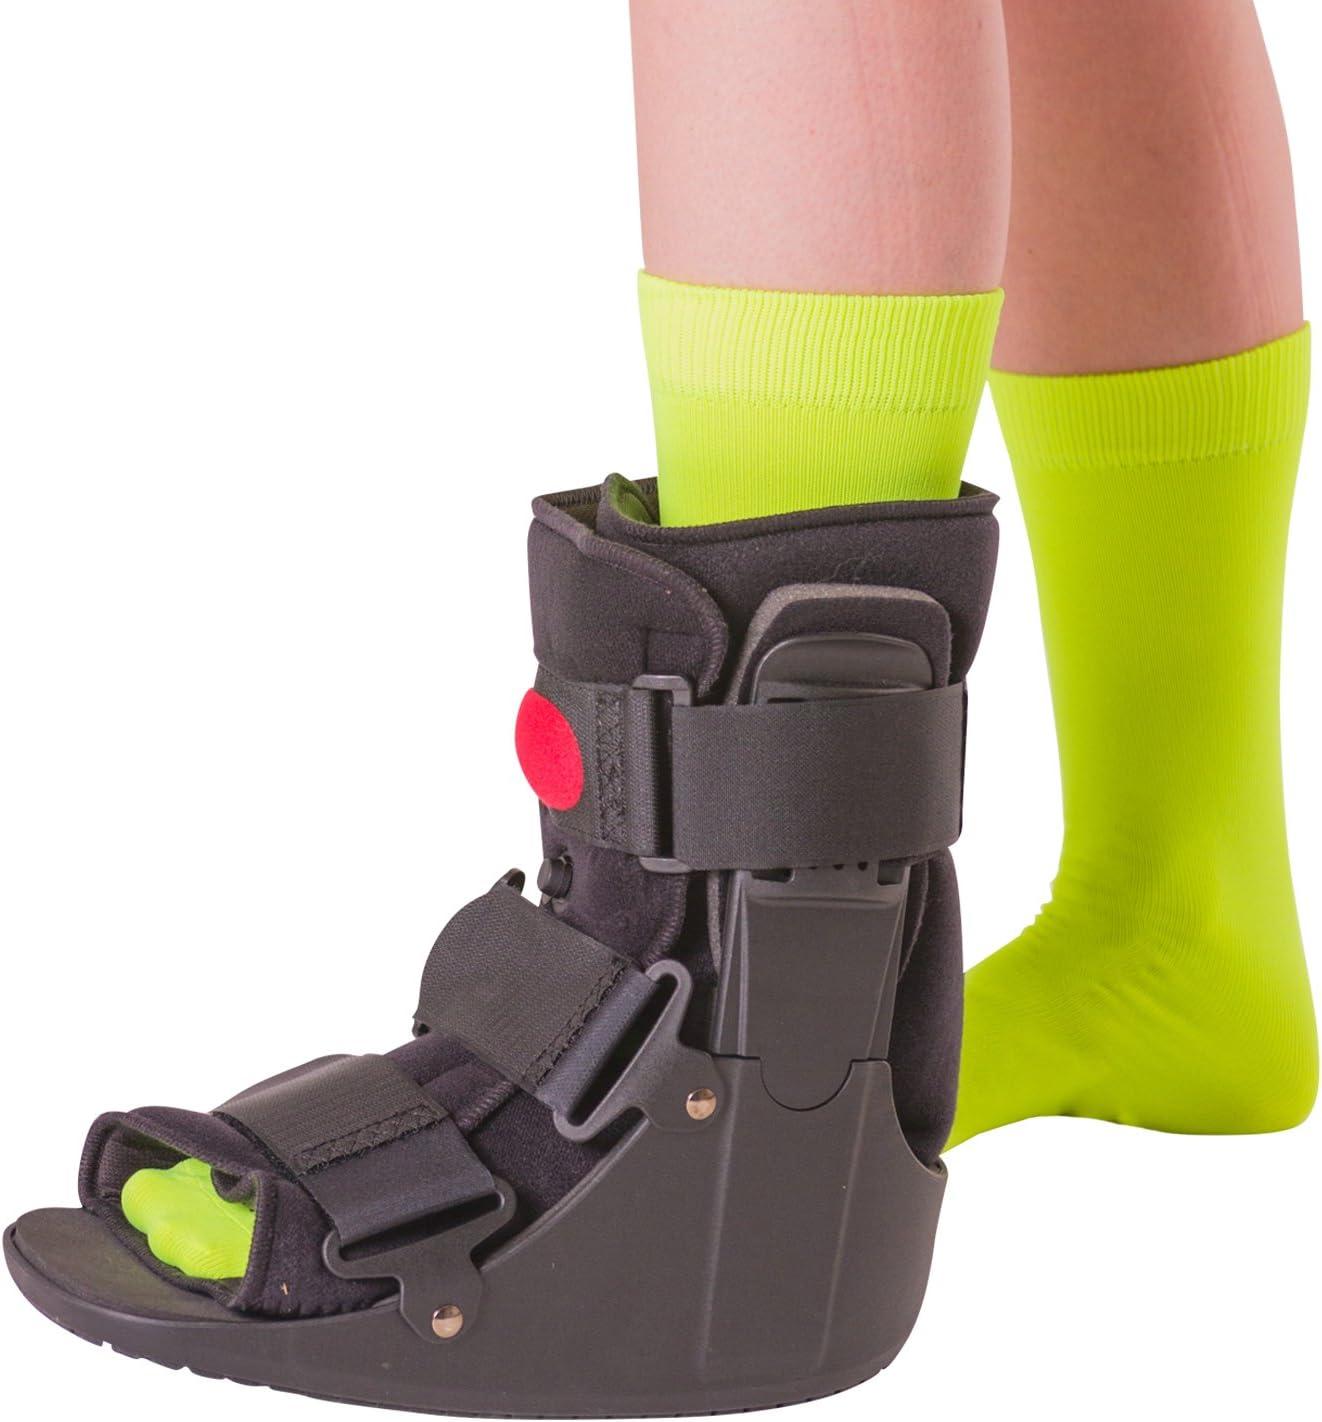 BraceAbility Short Air Ankle Walker Boot   Medical-Grade Orthopedic Foot Cast Brace for Sprained Ankle, Broken Foot, Toe Injury, Metatarsal Stress Fracture, Post Surgery, Achilles Tendonitis (Medium)